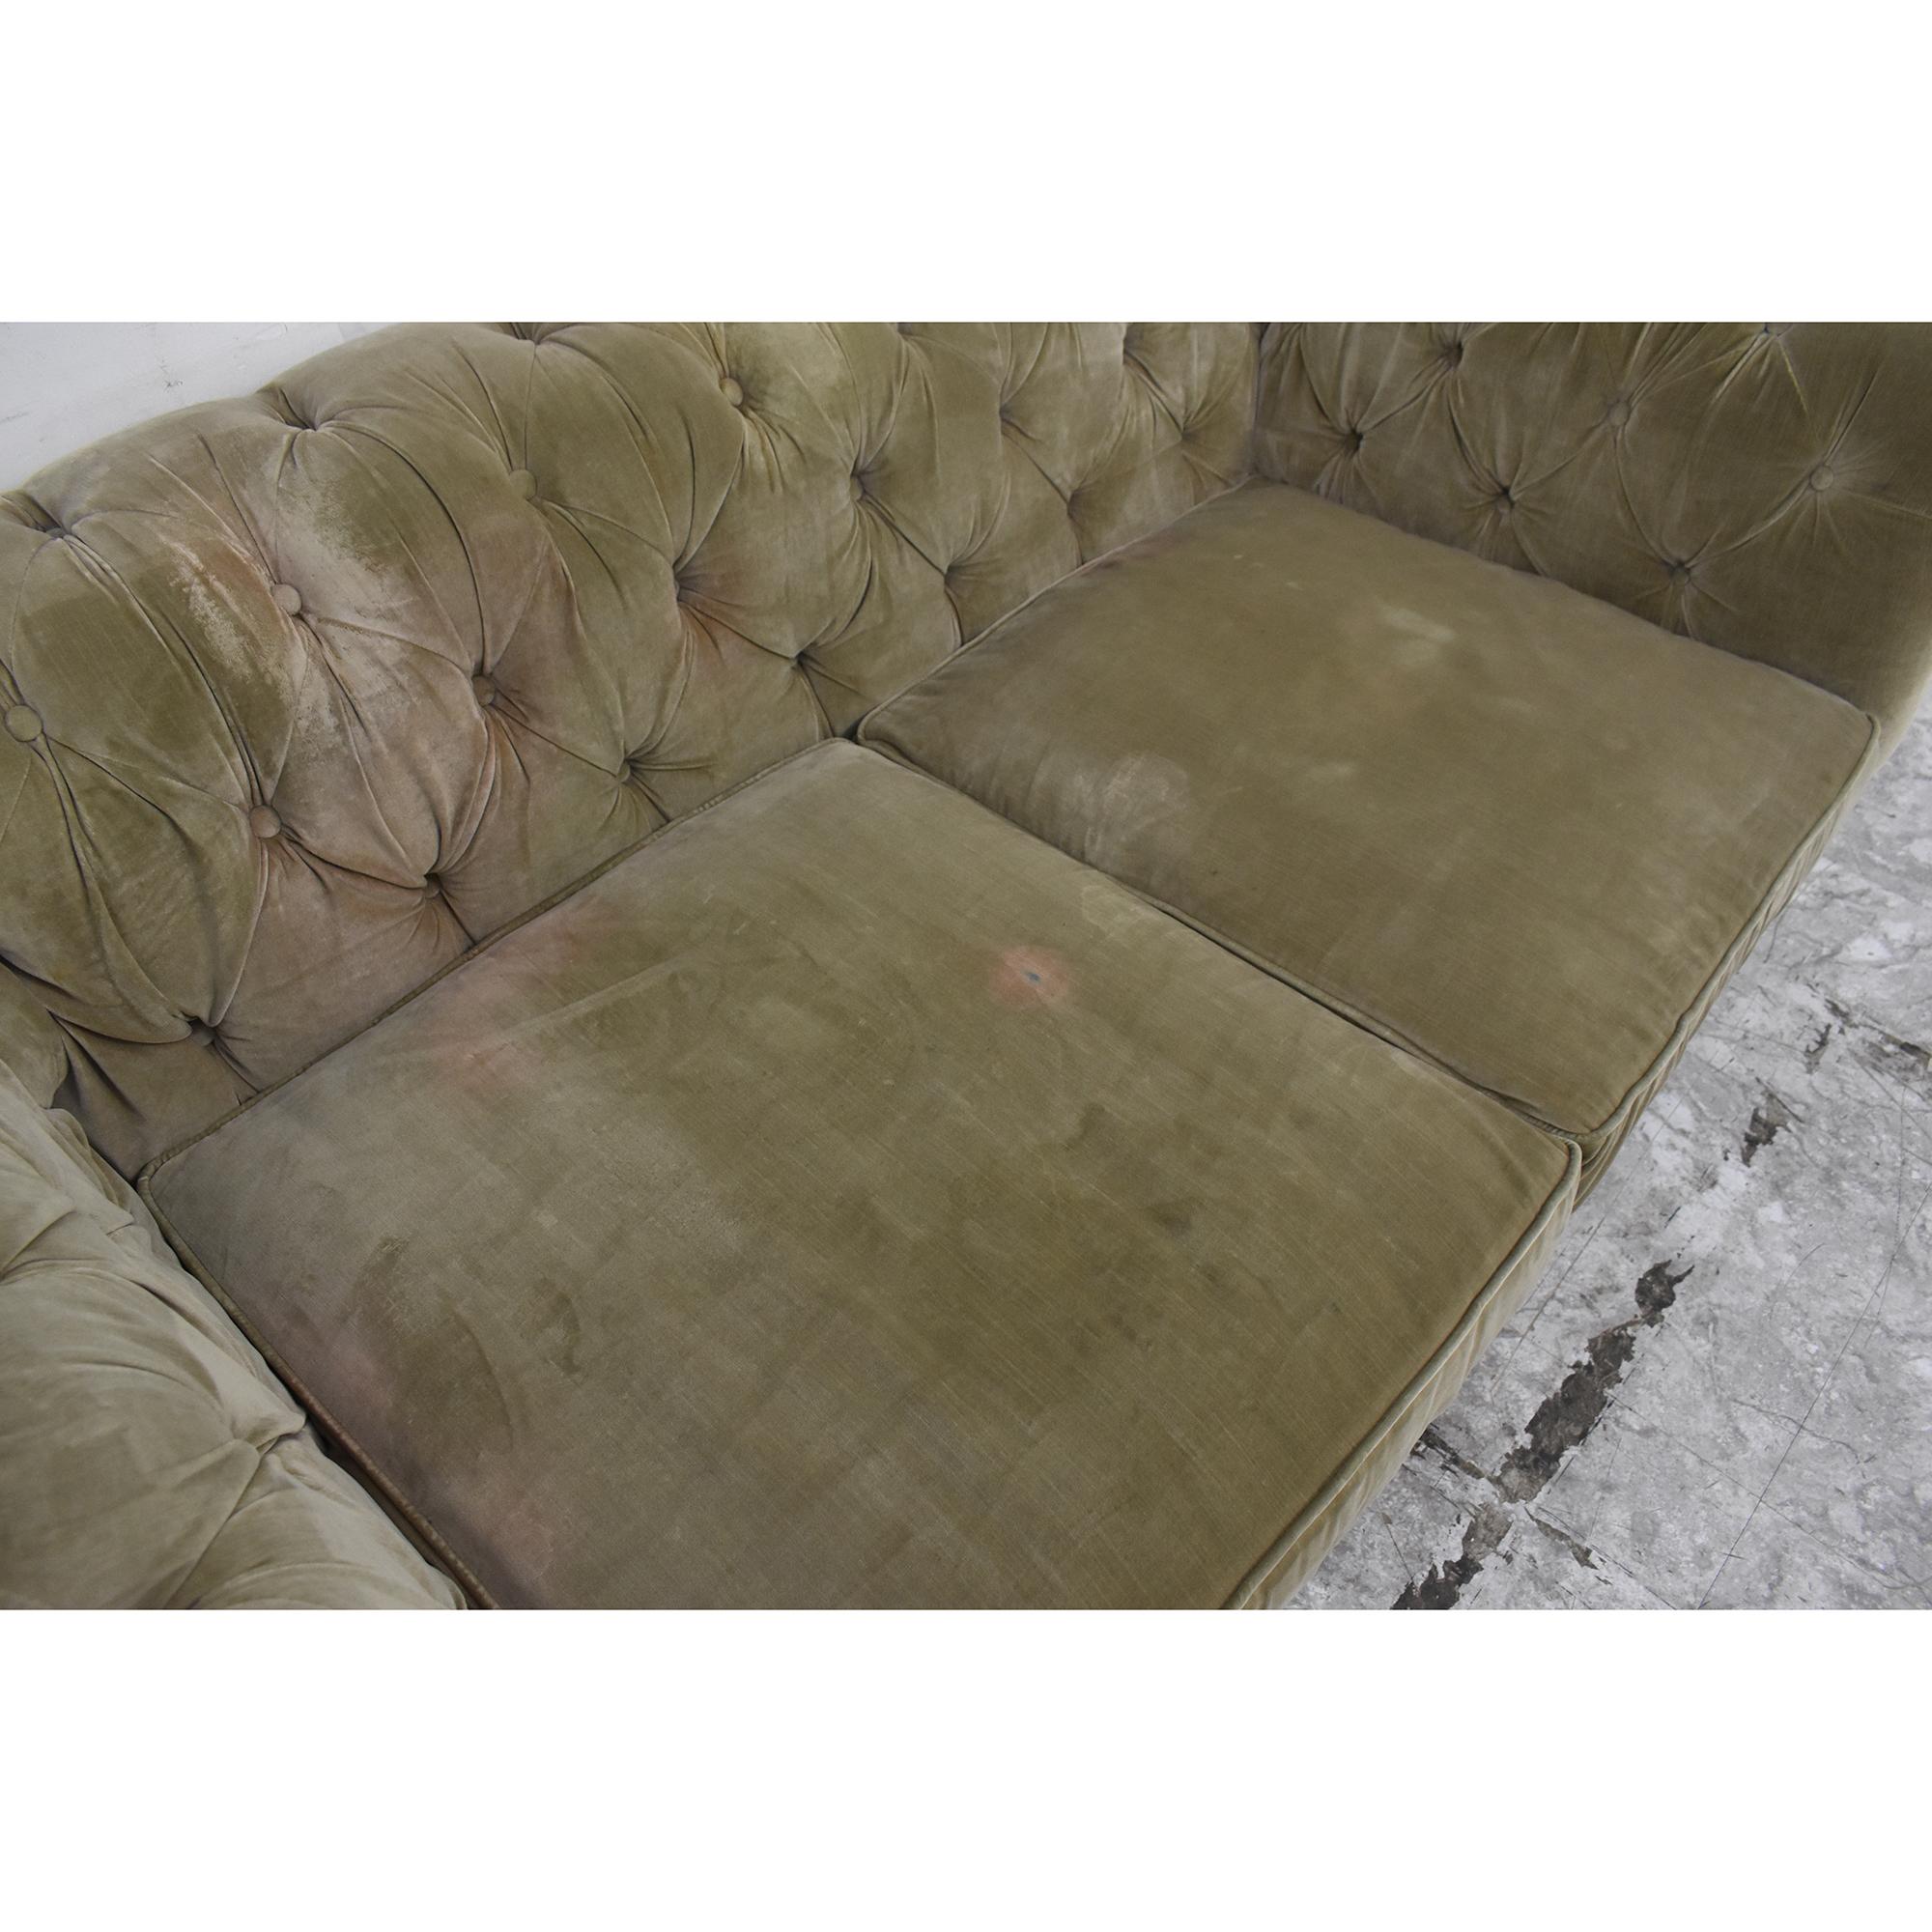 Restoration Hardware Restoration Hardware Kensington Sofa price